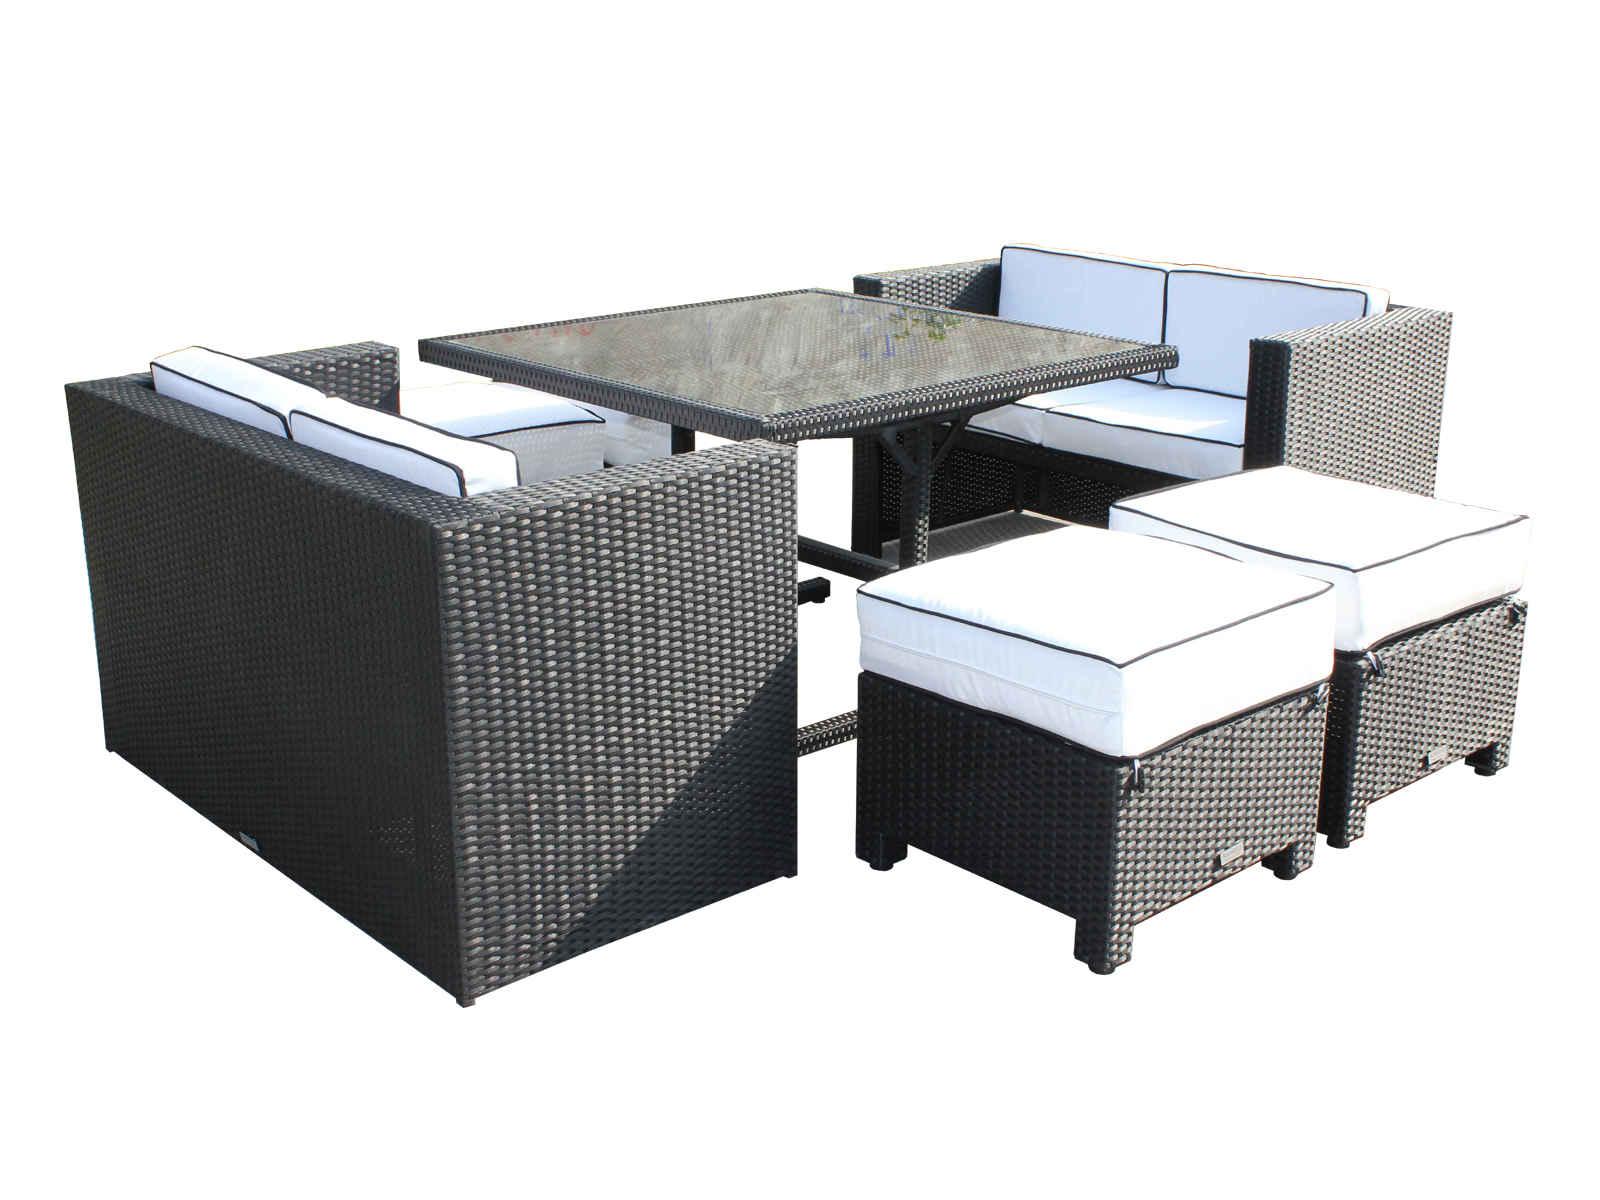 Rattan Garden Furniture Cube Sets Rattan Furniture Rattan Direct